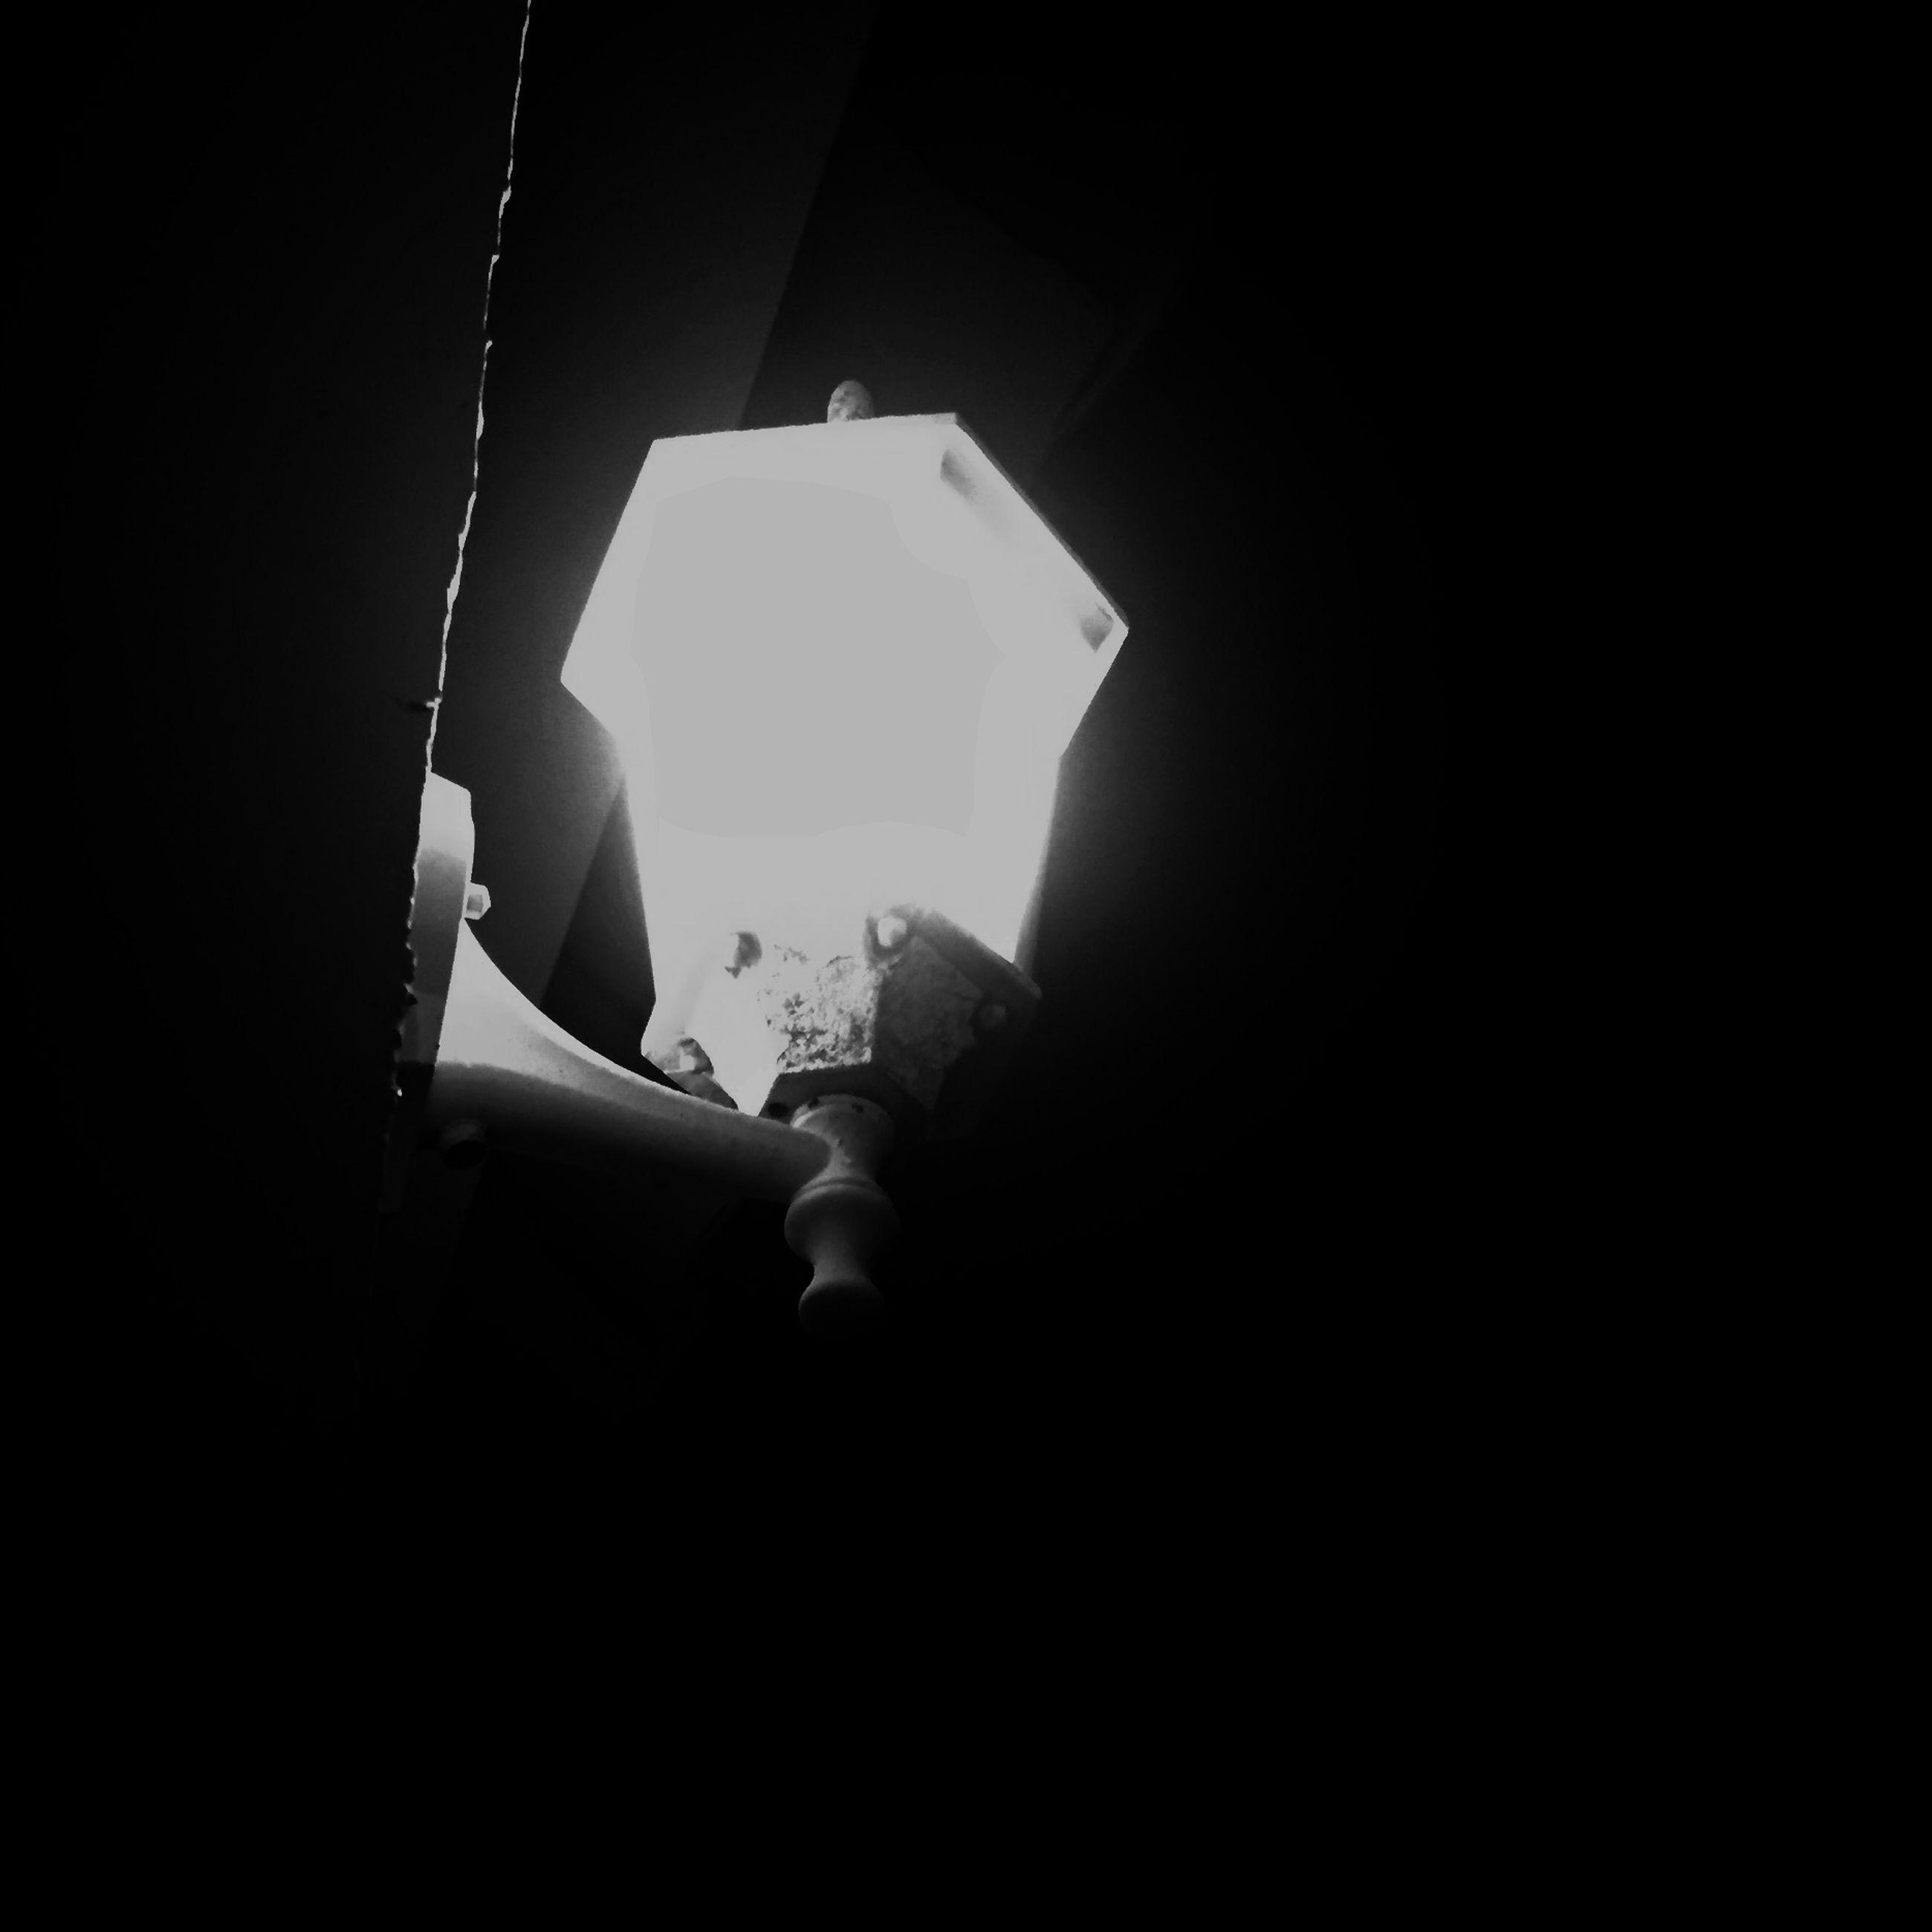 indoors, holding, lifestyles, person, men, dark, copy space, leisure activity, home interior, part of, window, sitting, cropped, darkroom, black background, side view, studio shot